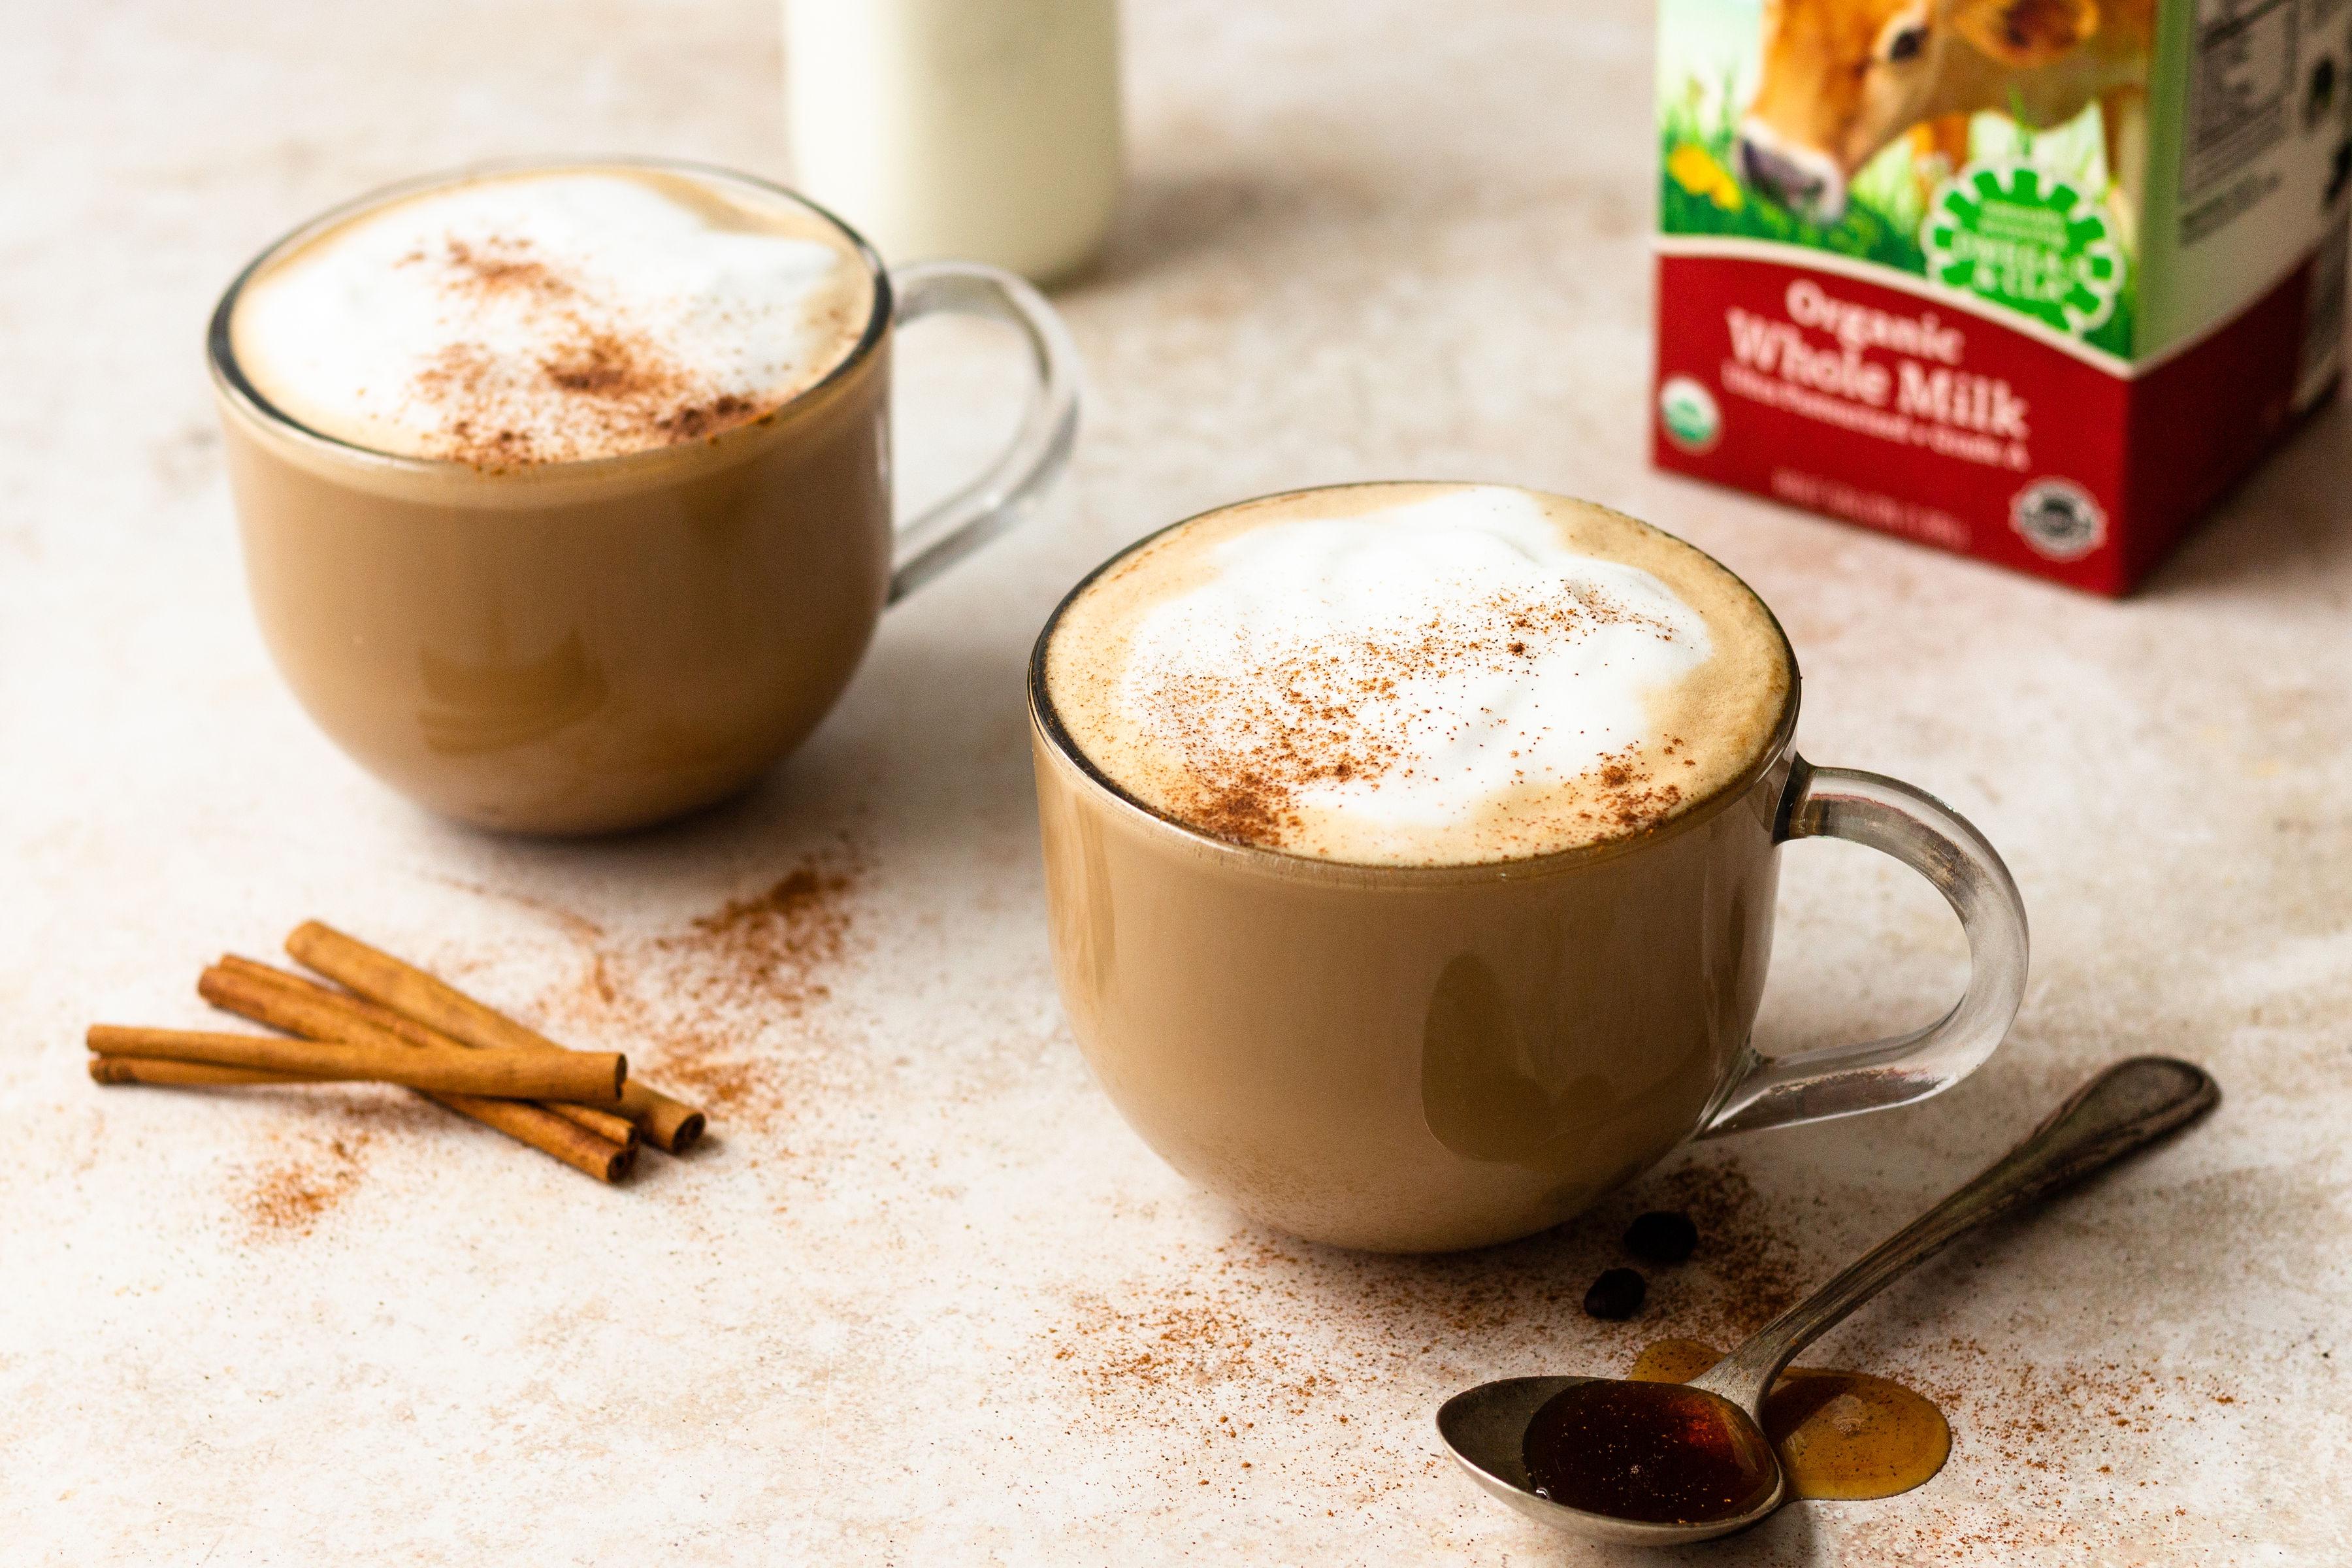 Maple cinnamon latte made Organic Valley Grassmilk.